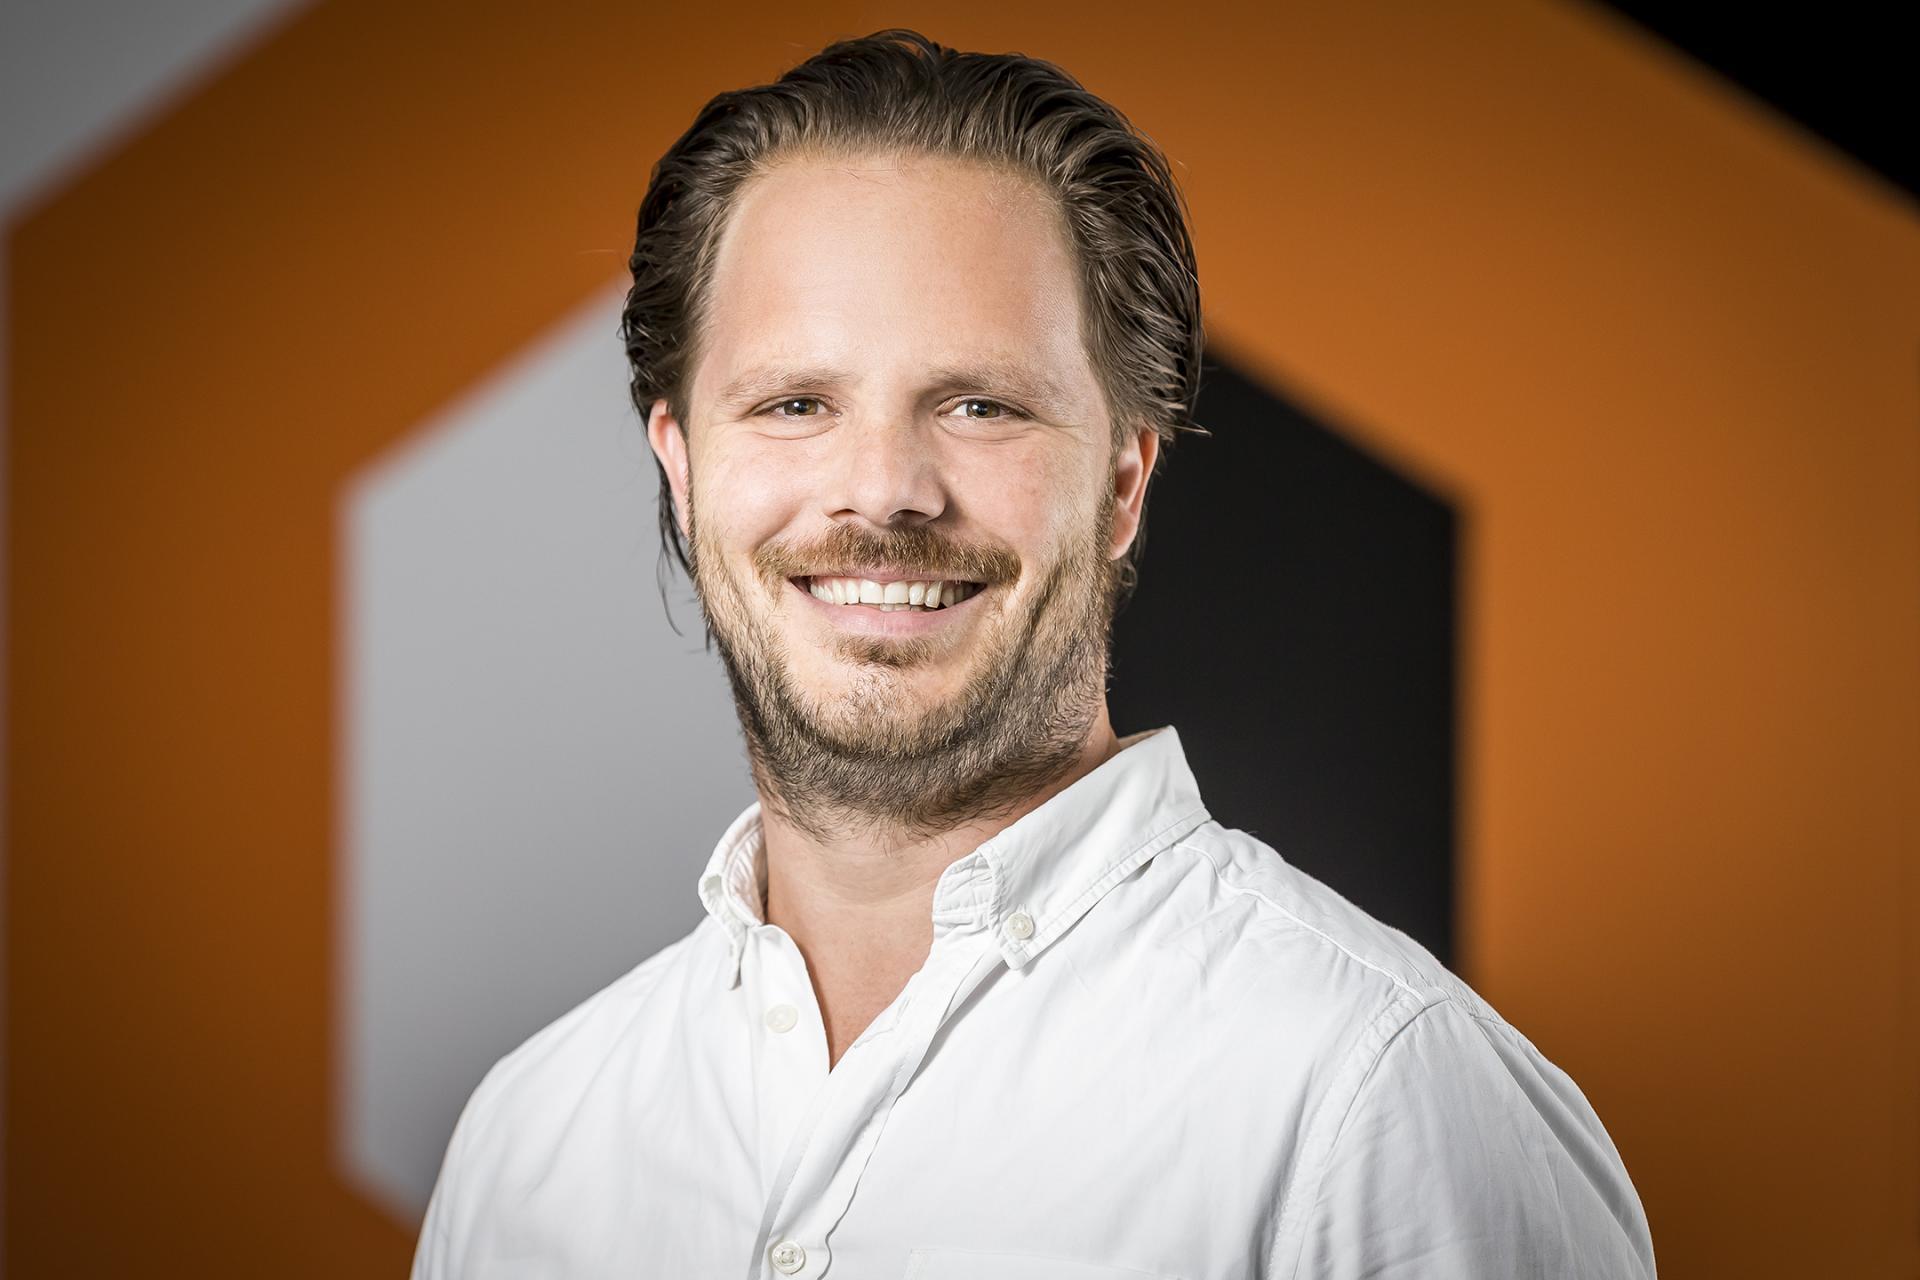 Profilbild Christian Graf